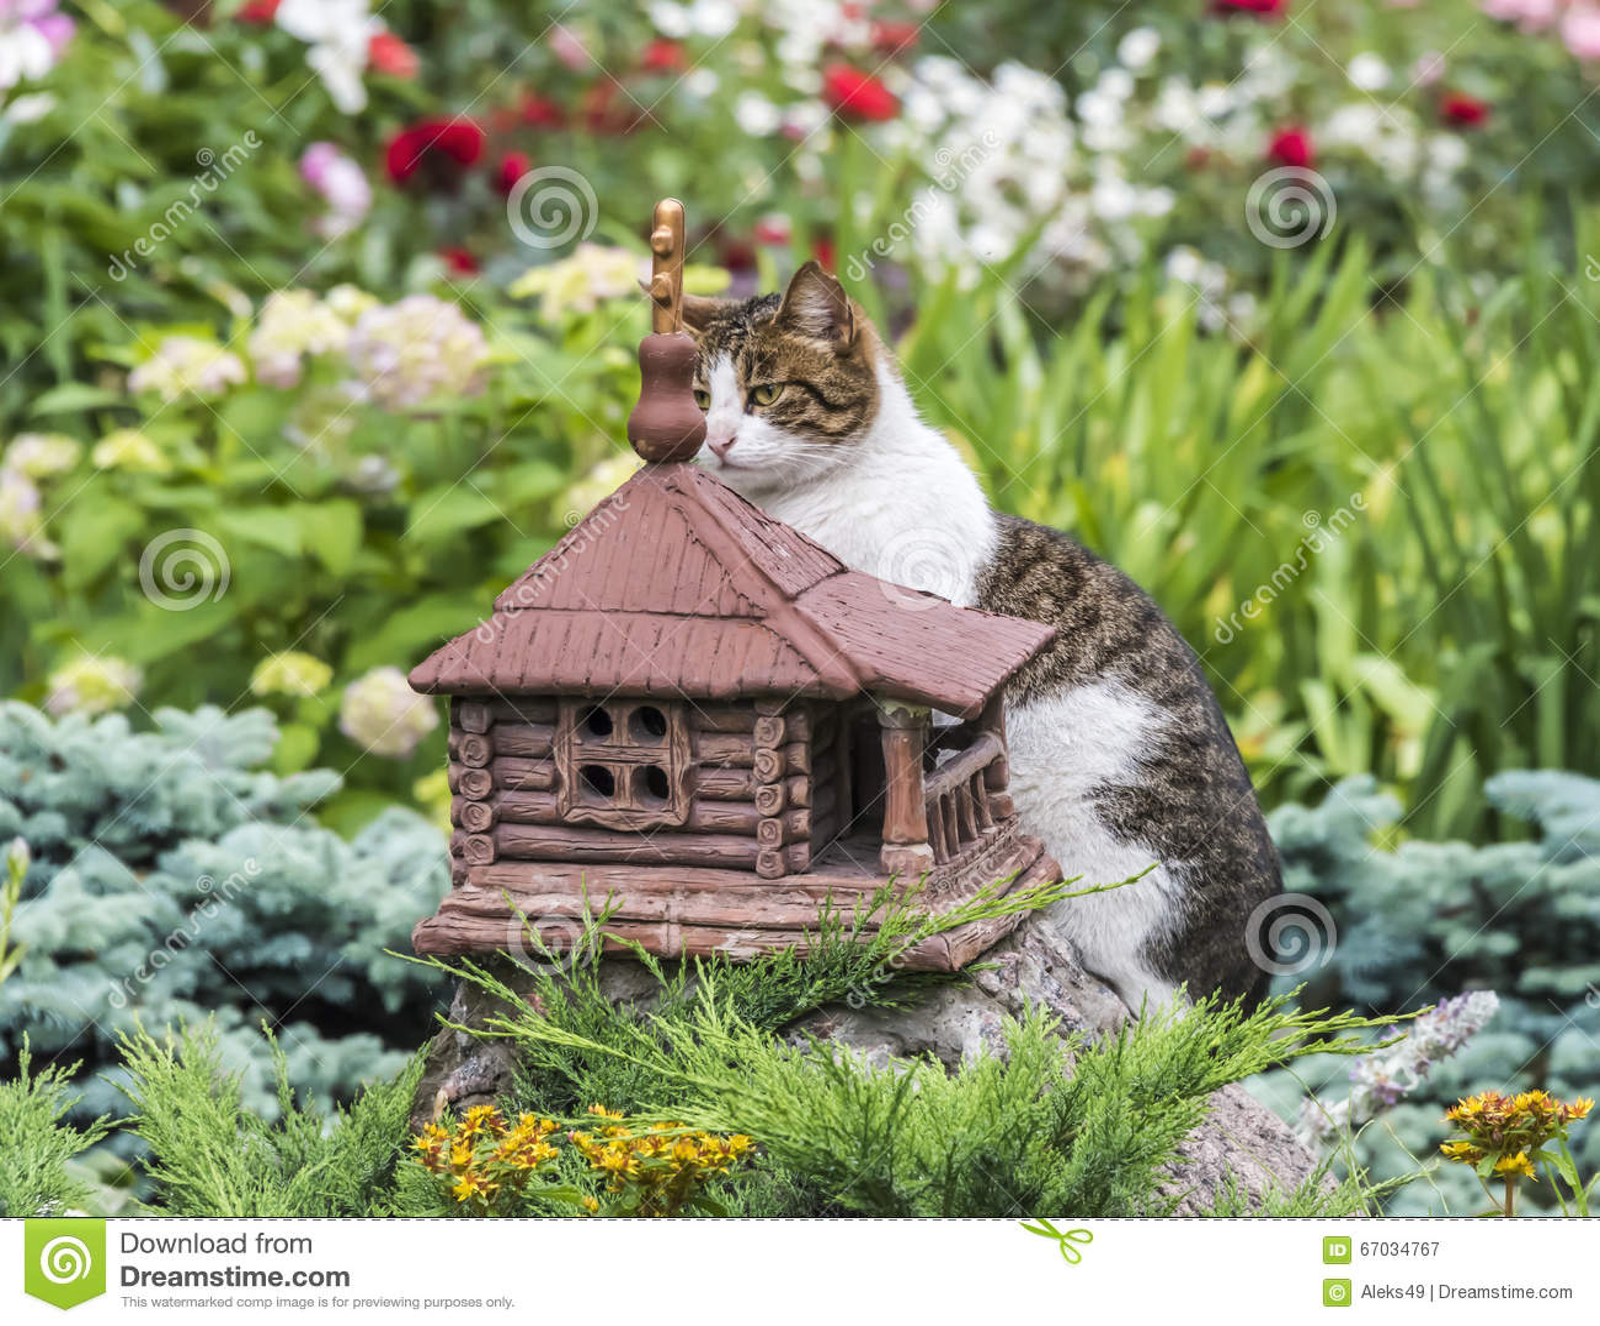 Cat chooses a new home